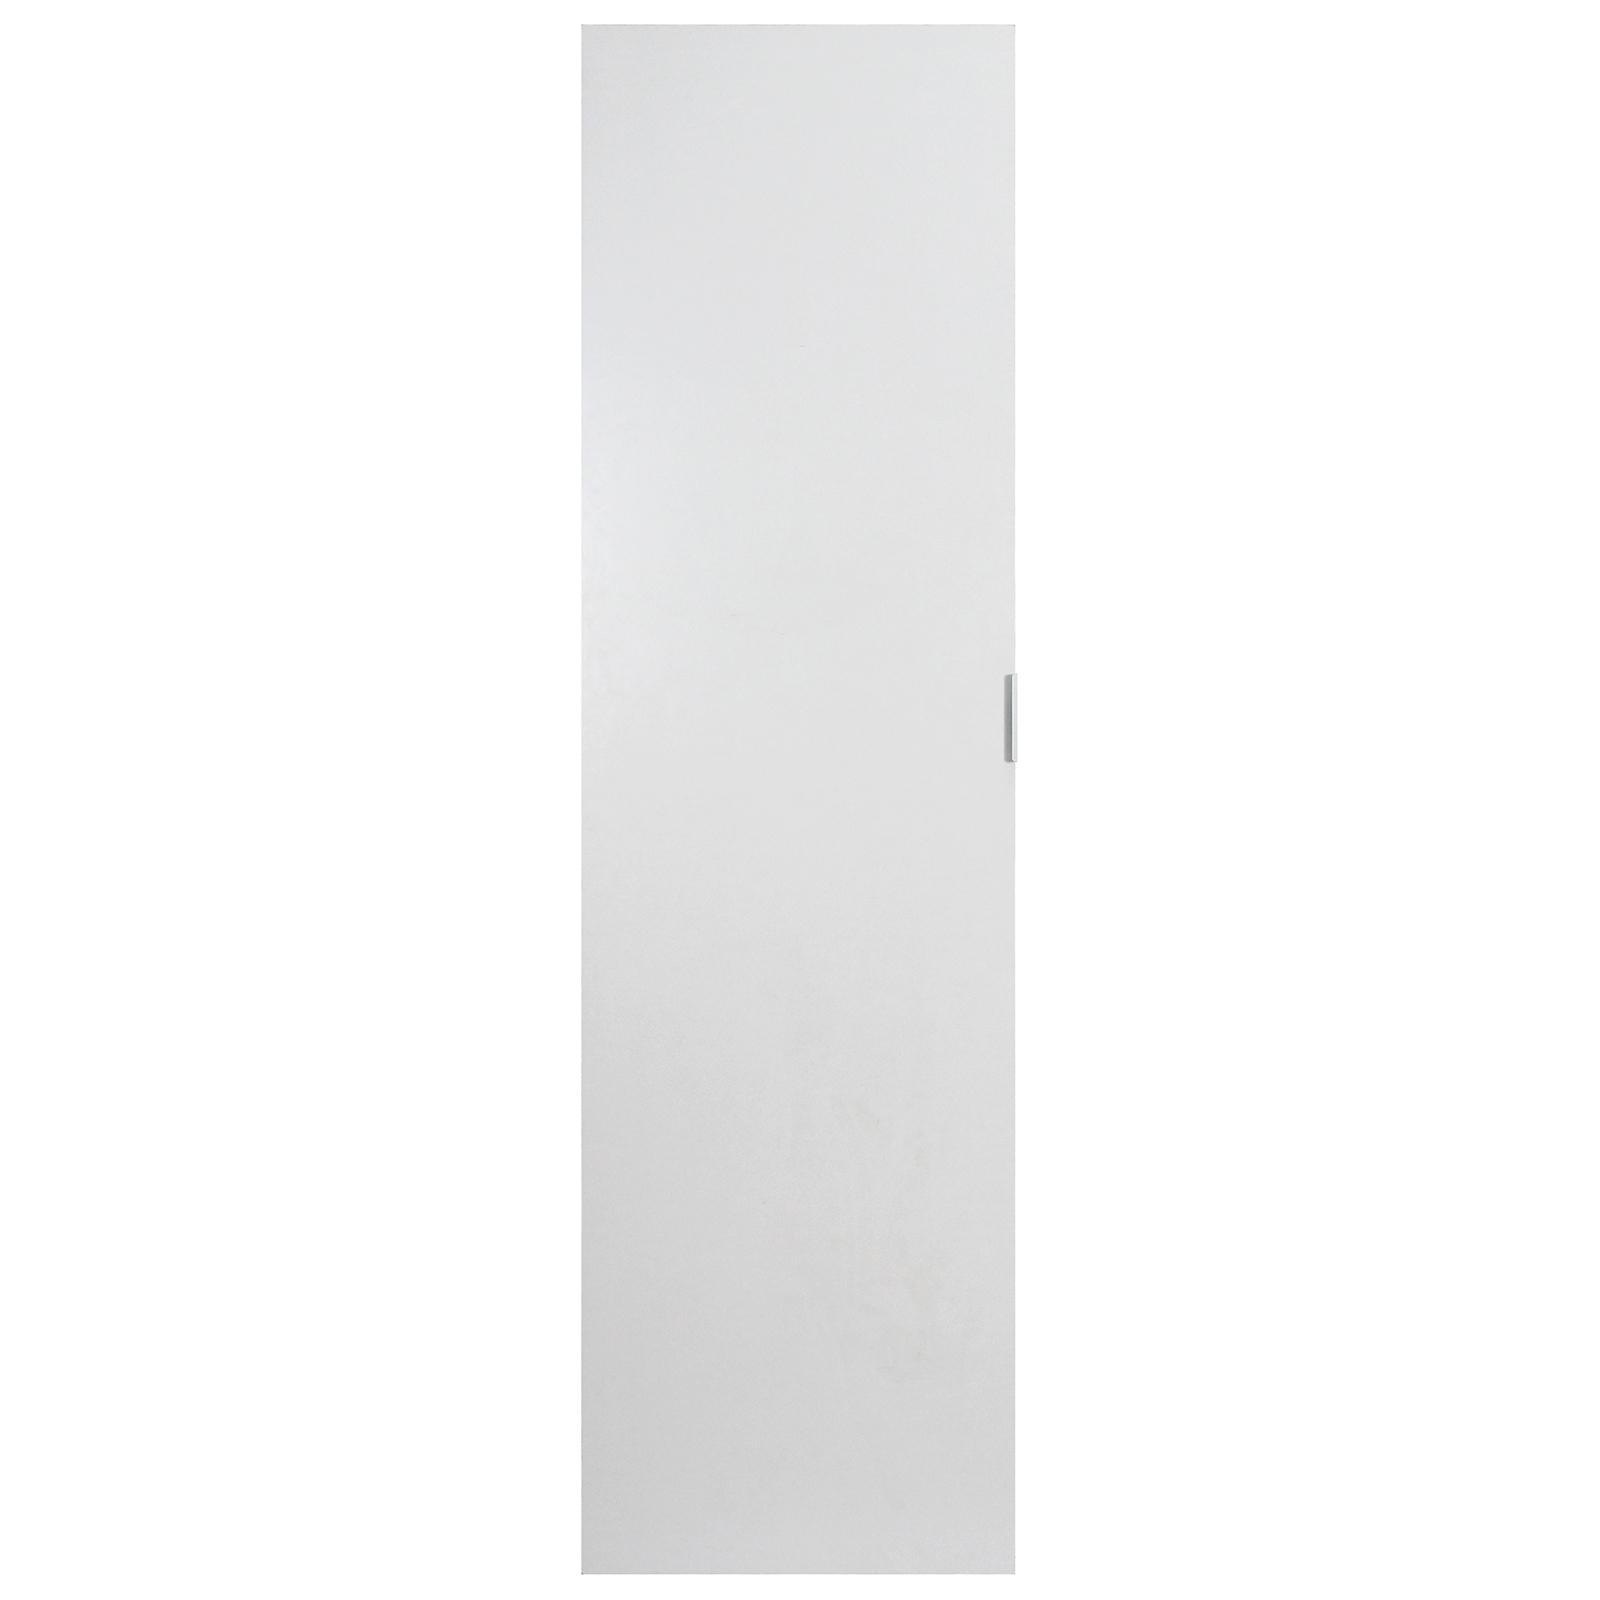 Flexi Storage White Hinge Wardrobe Door